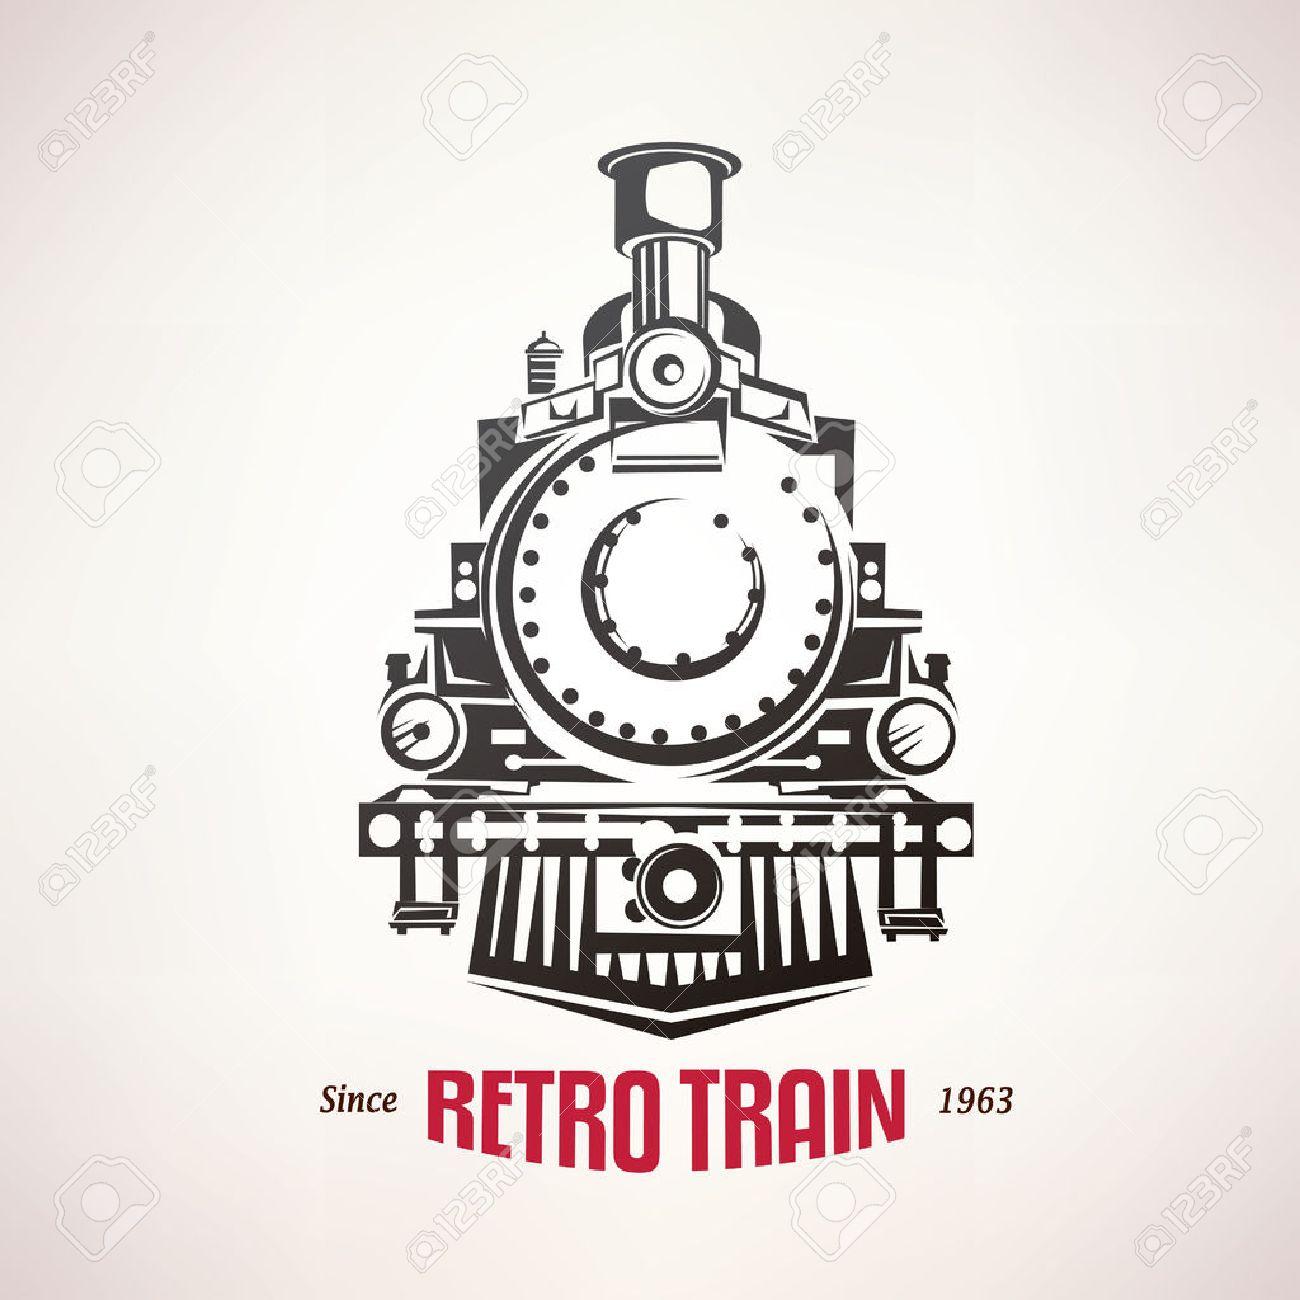 retro train, vintage vector symbol, emblem, label template - 48177142